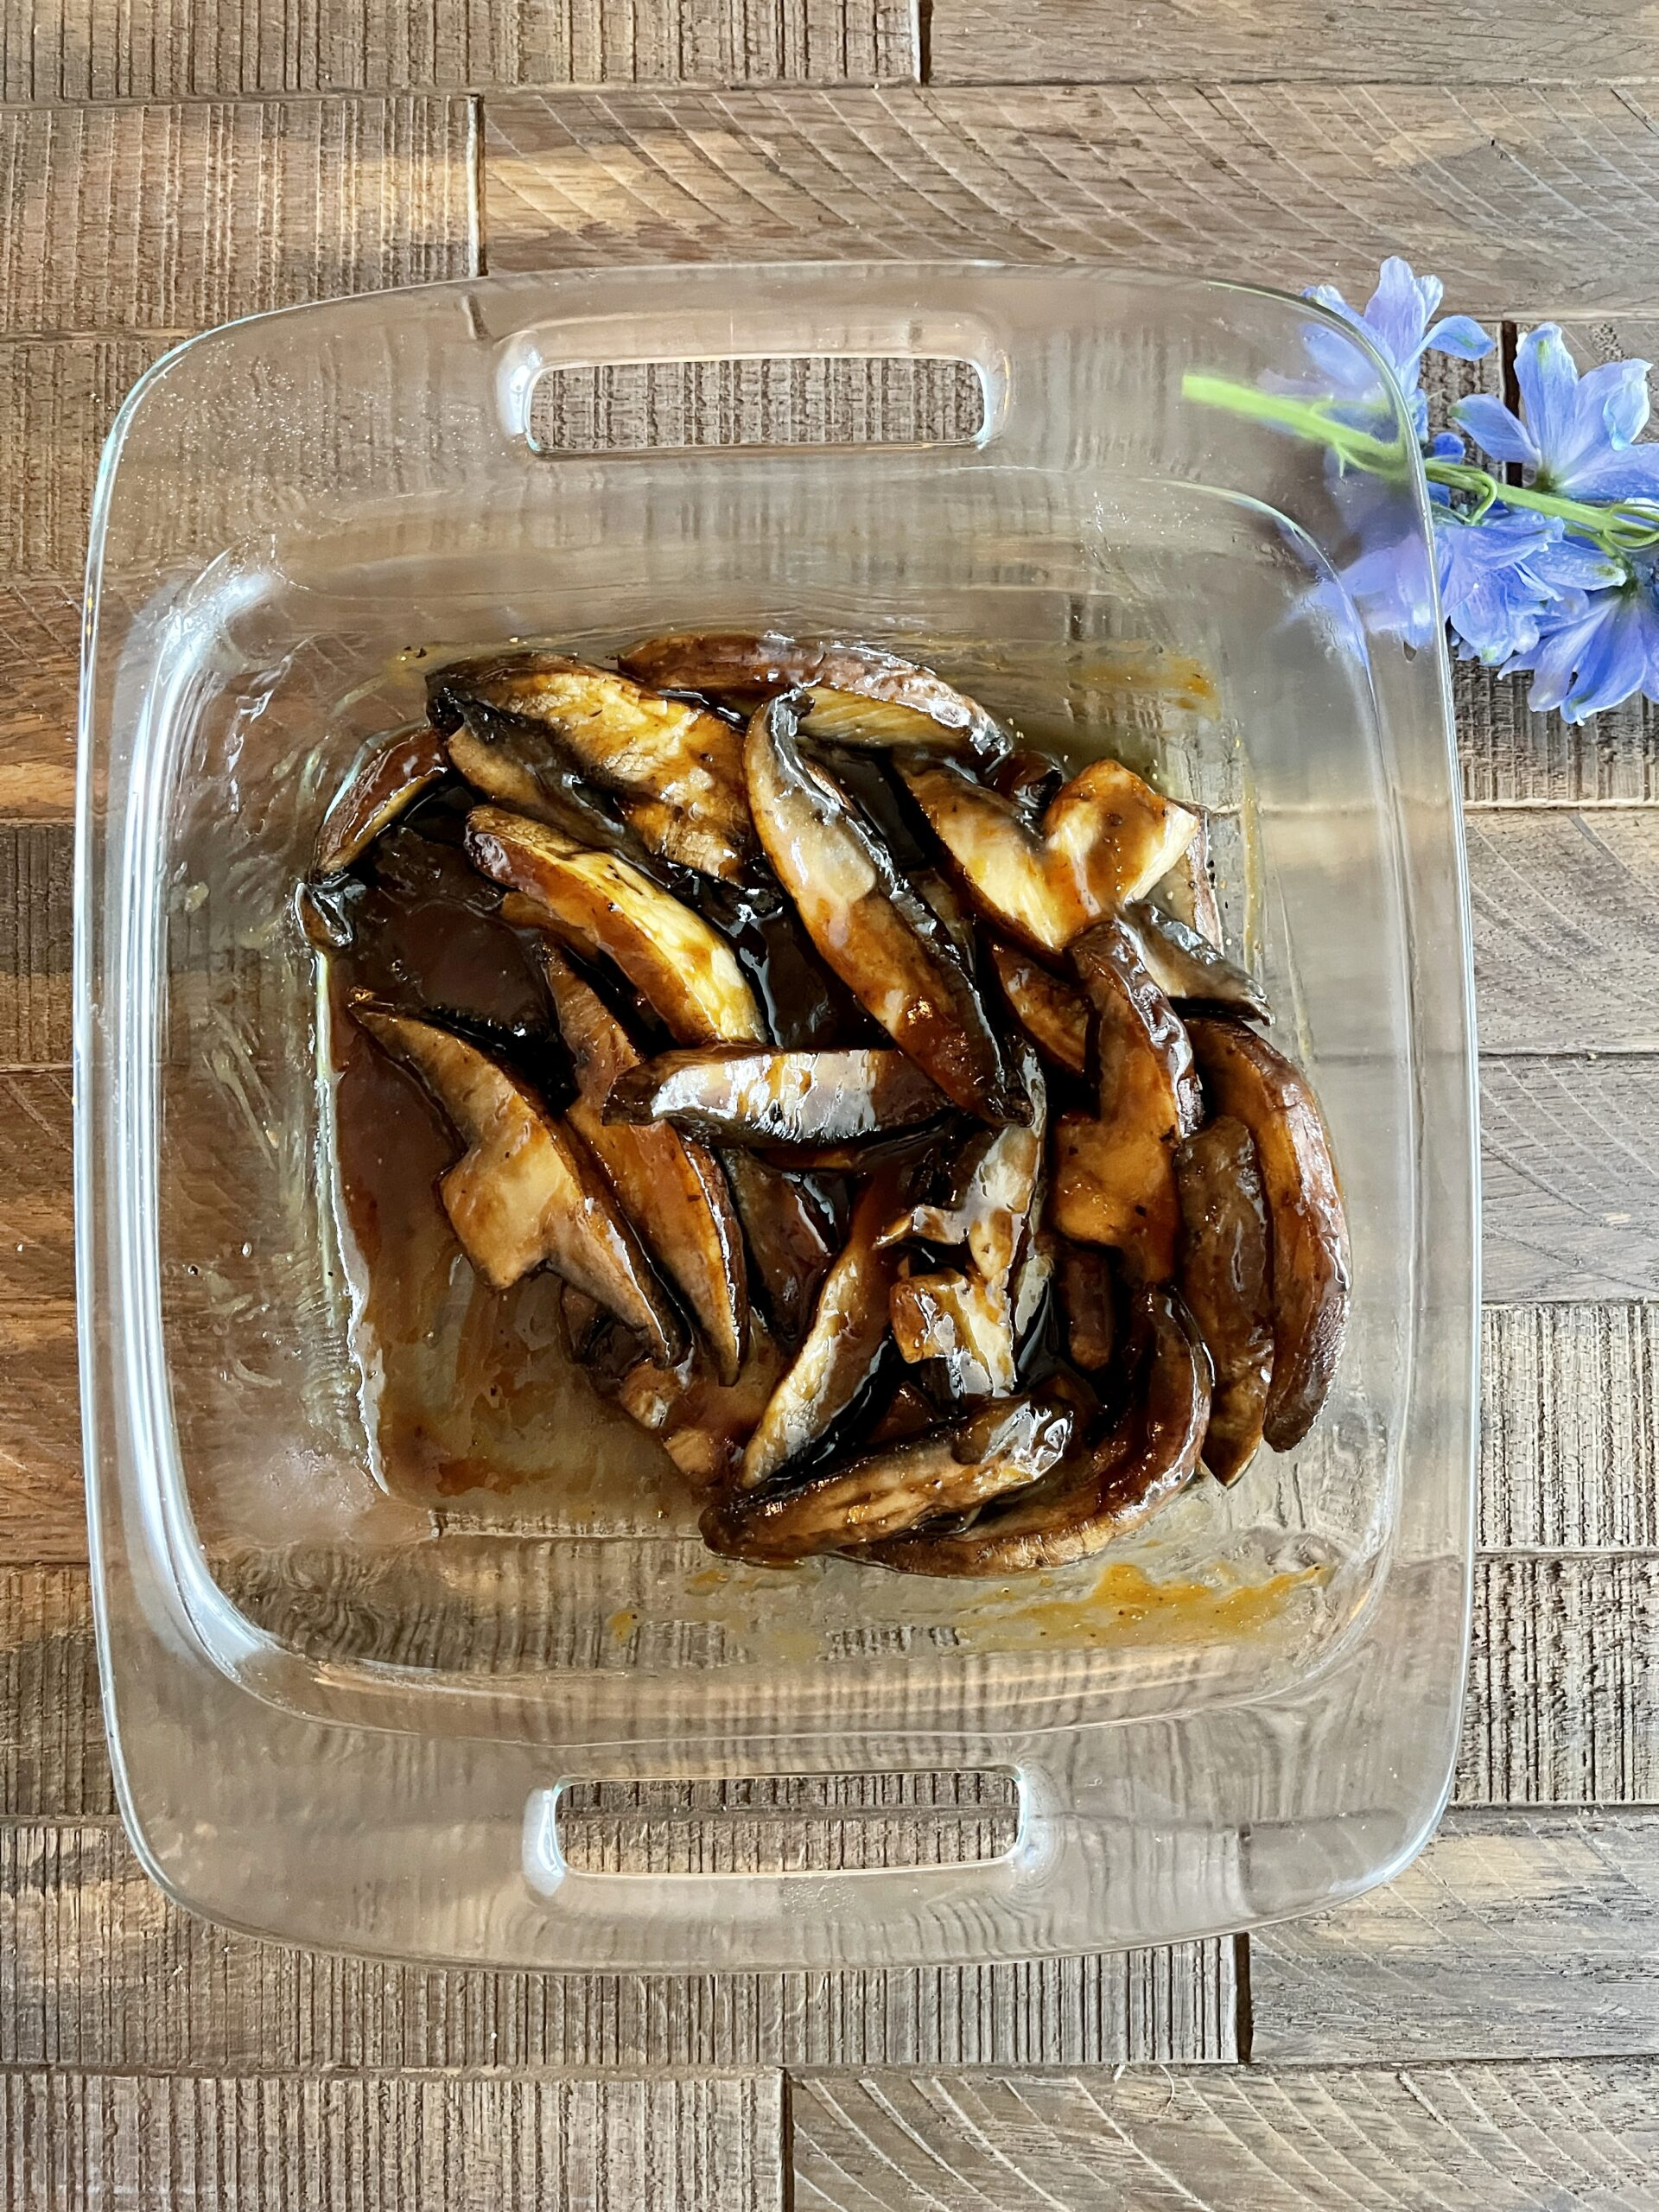 Grilled portobello mushrooms with barbecue sauce